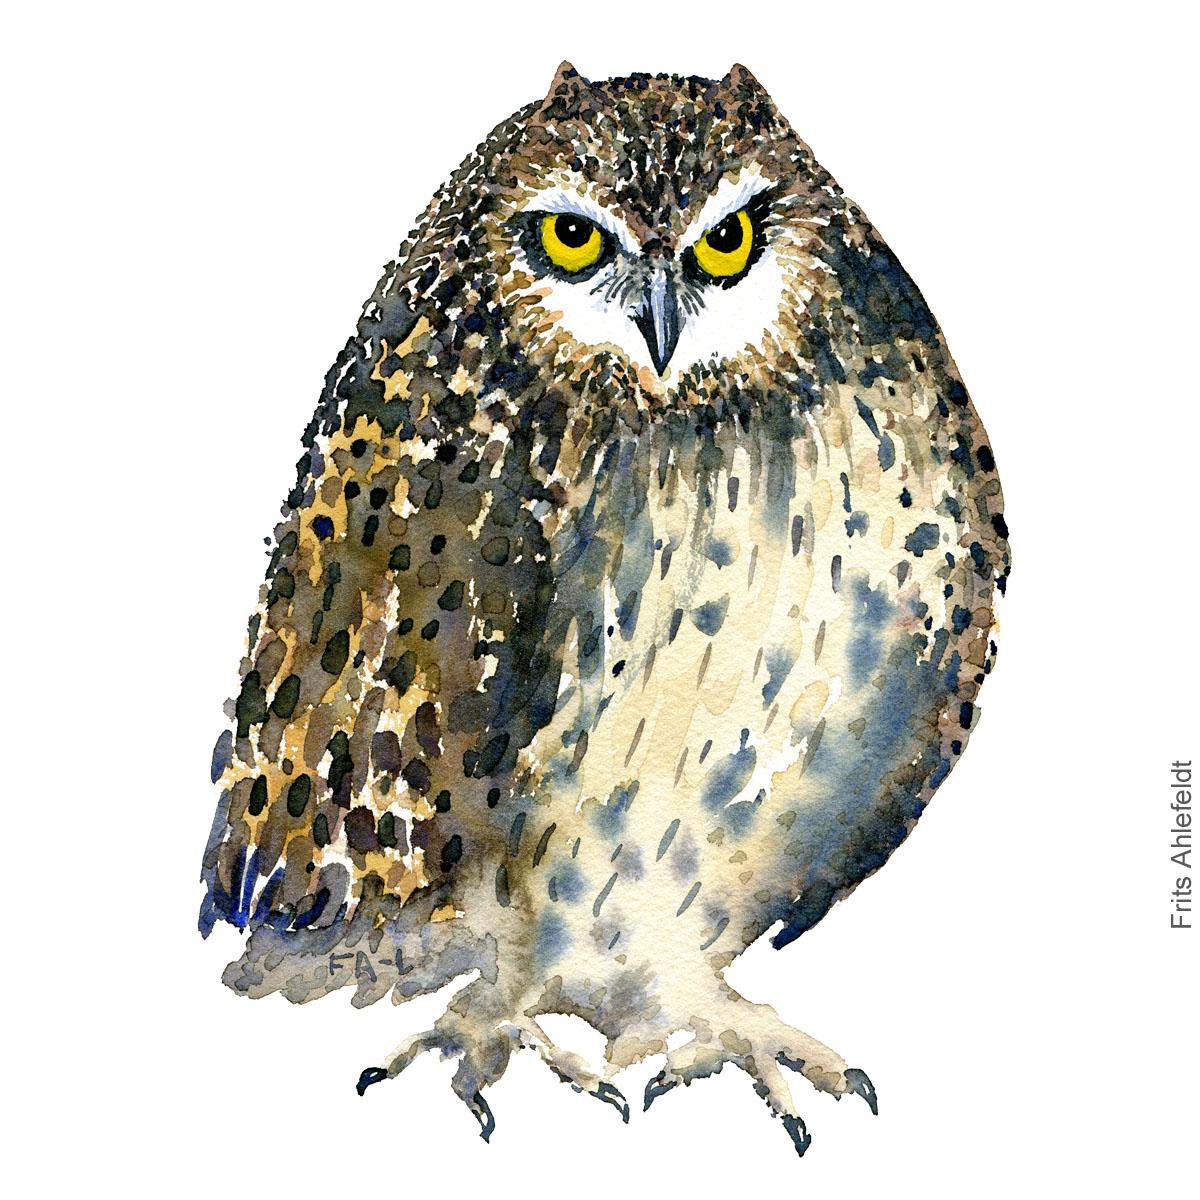 Ugle - Owl - Bird watercolor painting. Artwork by Frits Ahlefeldt. Fugle akvarel